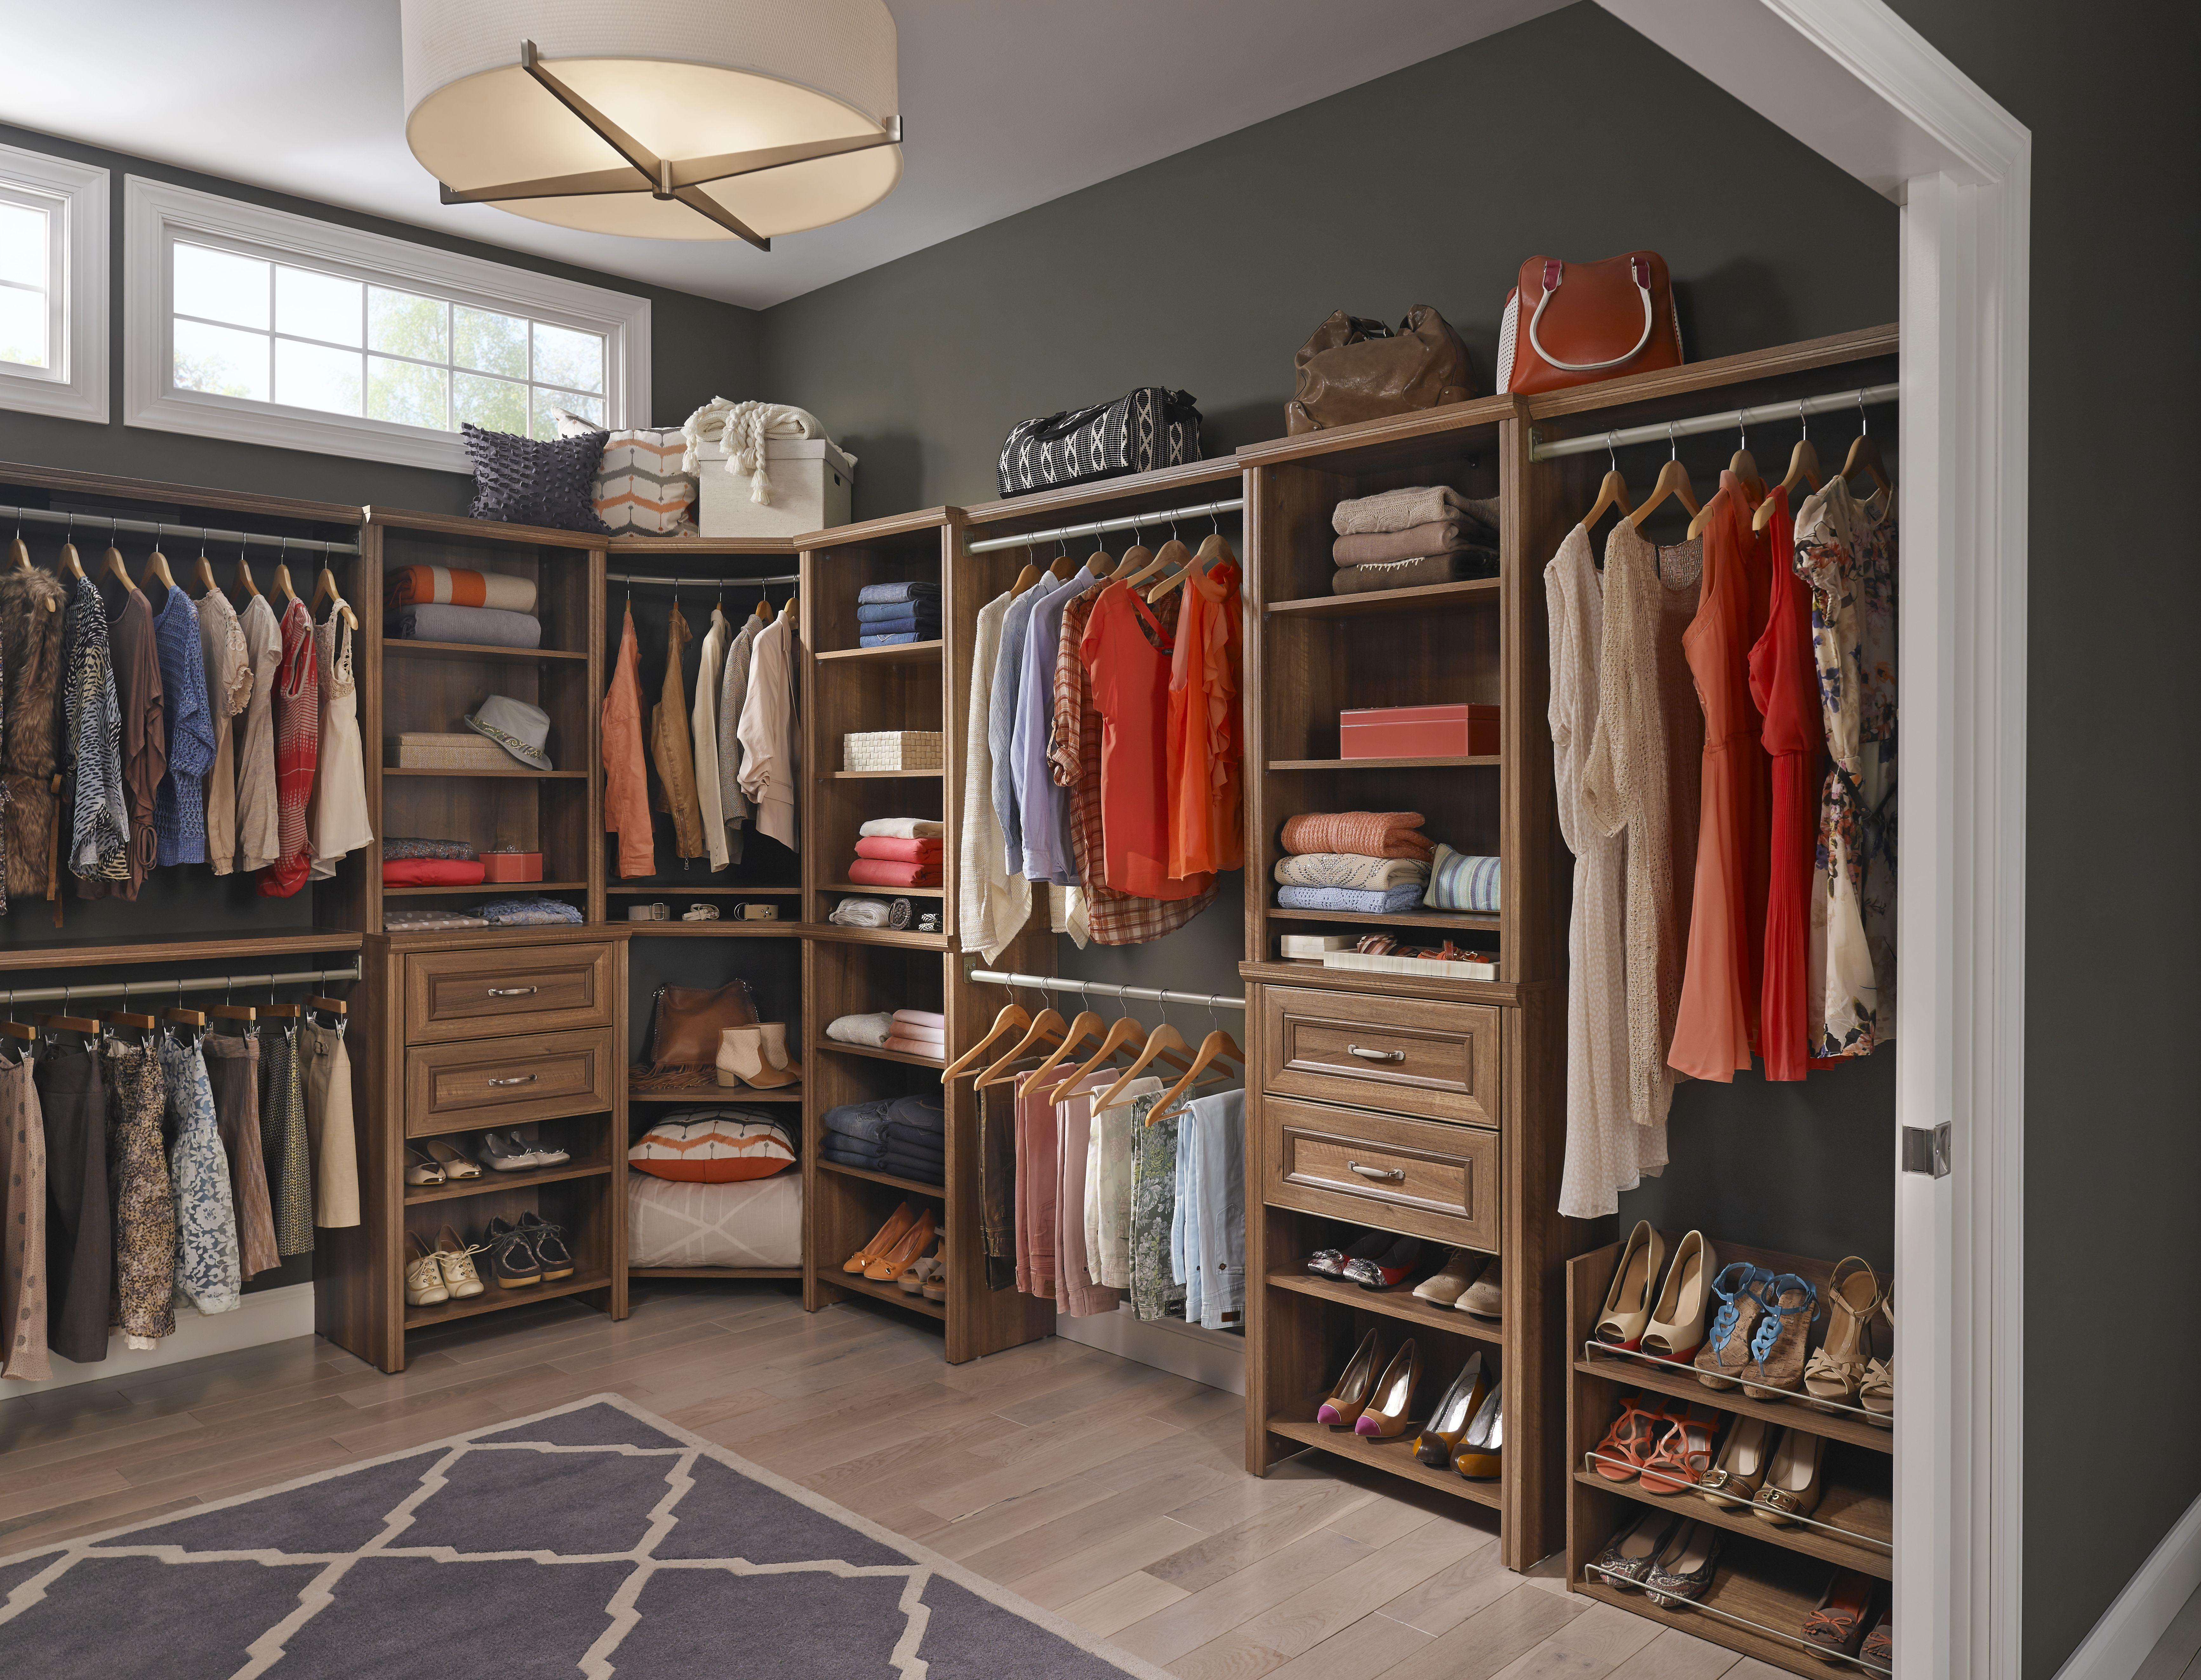 Fabulous Rubbermaid Closet Kit For Appealing Home Decoration Ideas